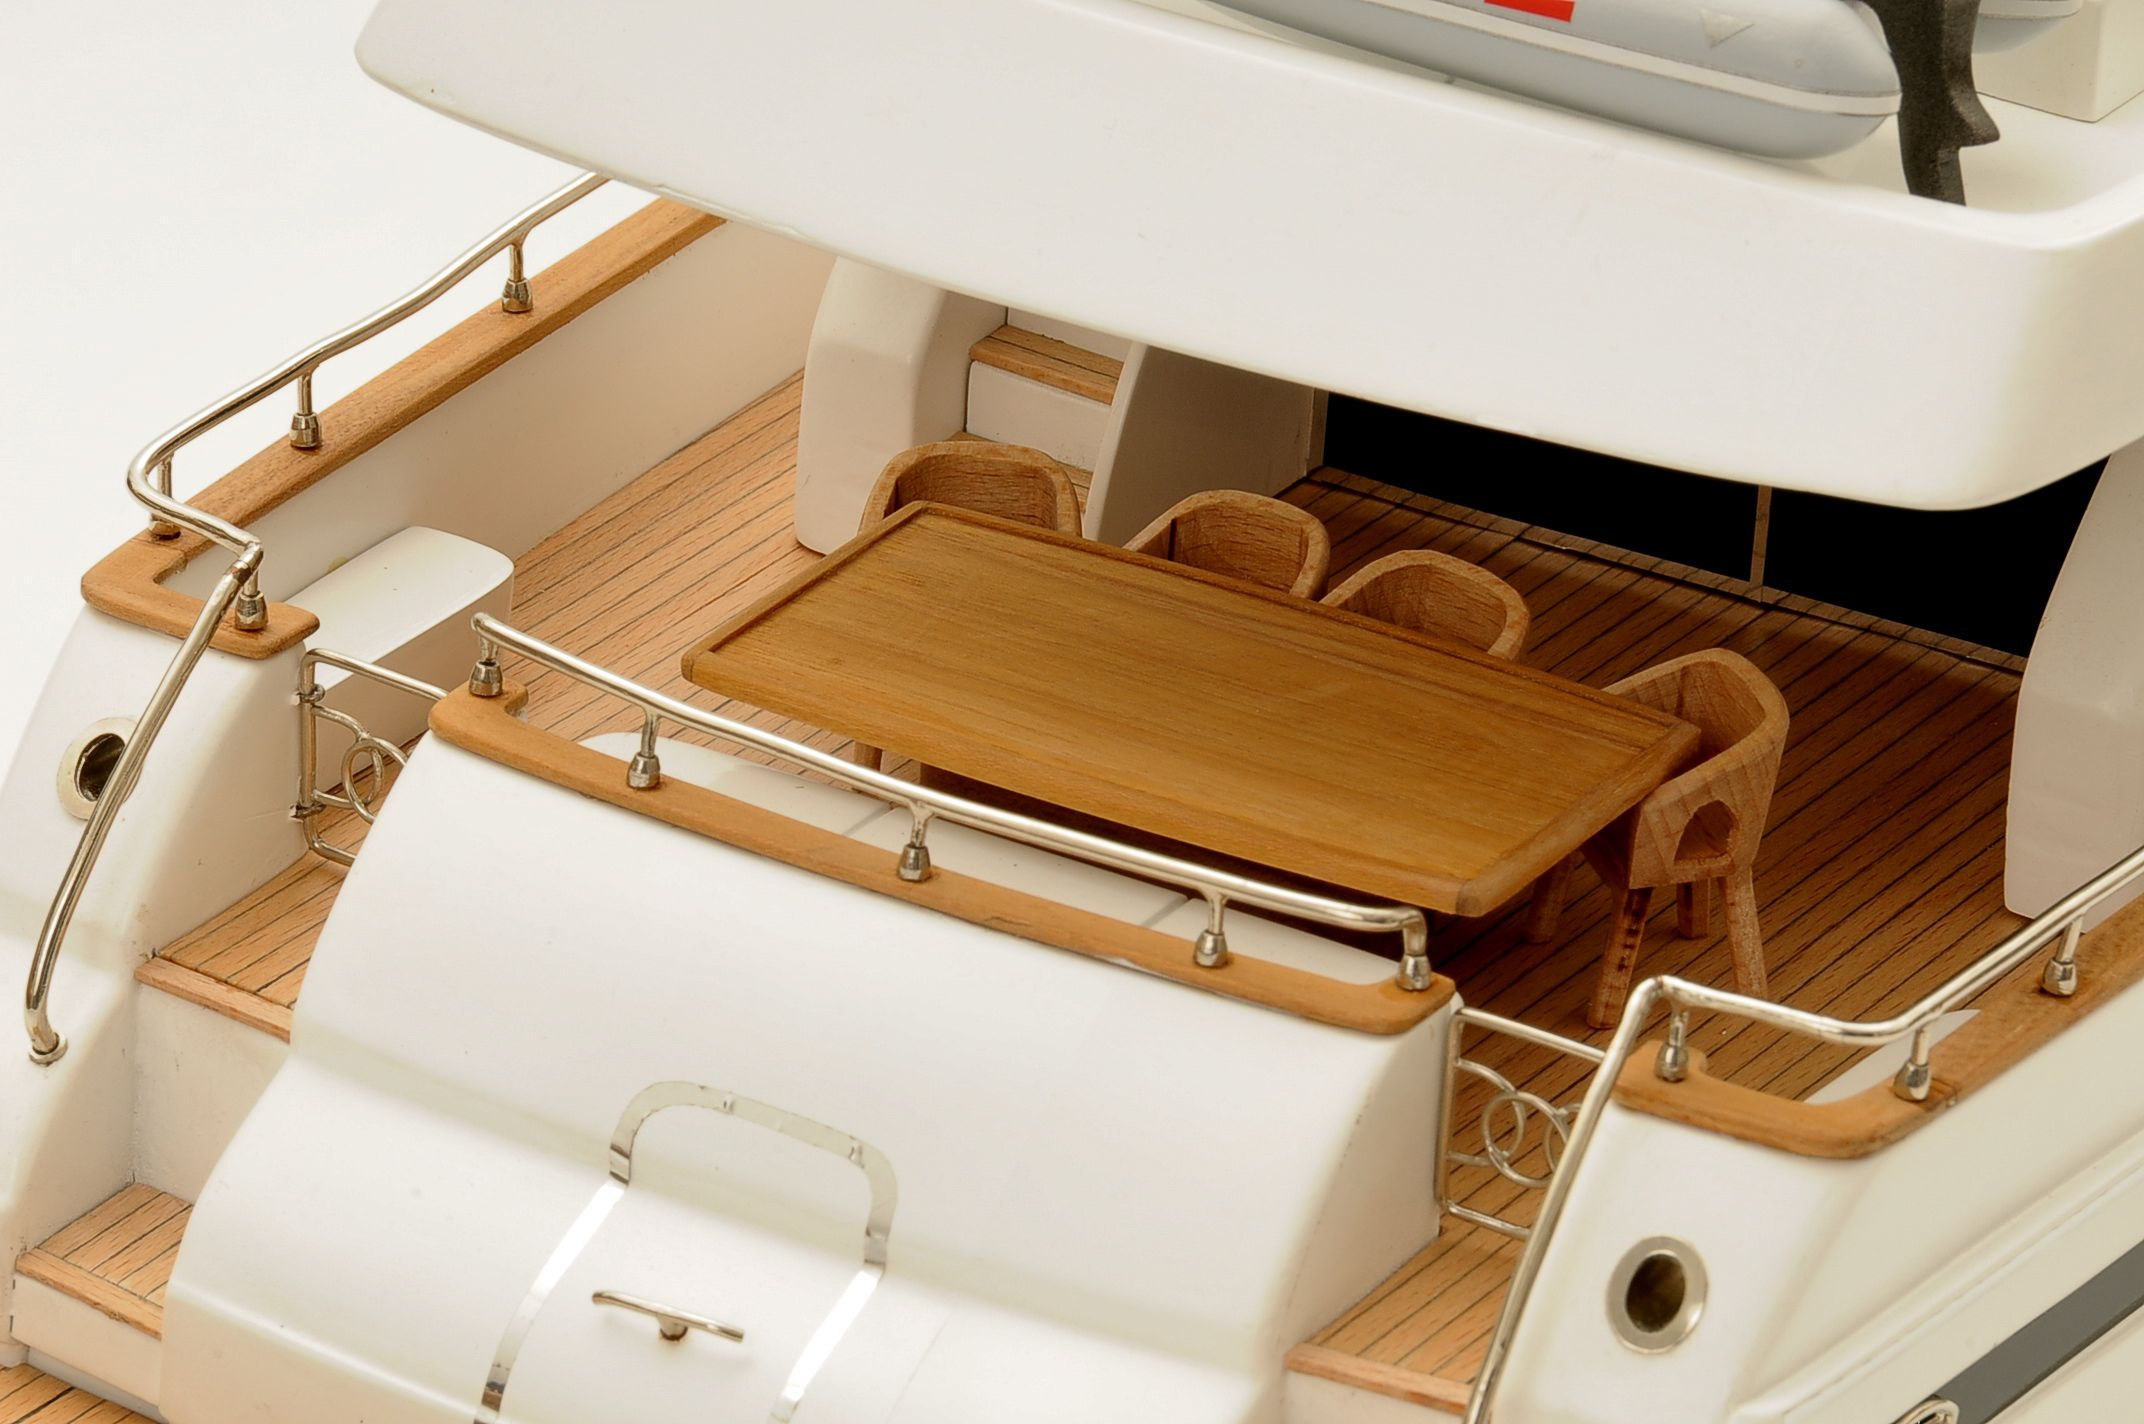 1236-6359-Astondoa-72-GLX-Motor-Yacht-Premier-Range